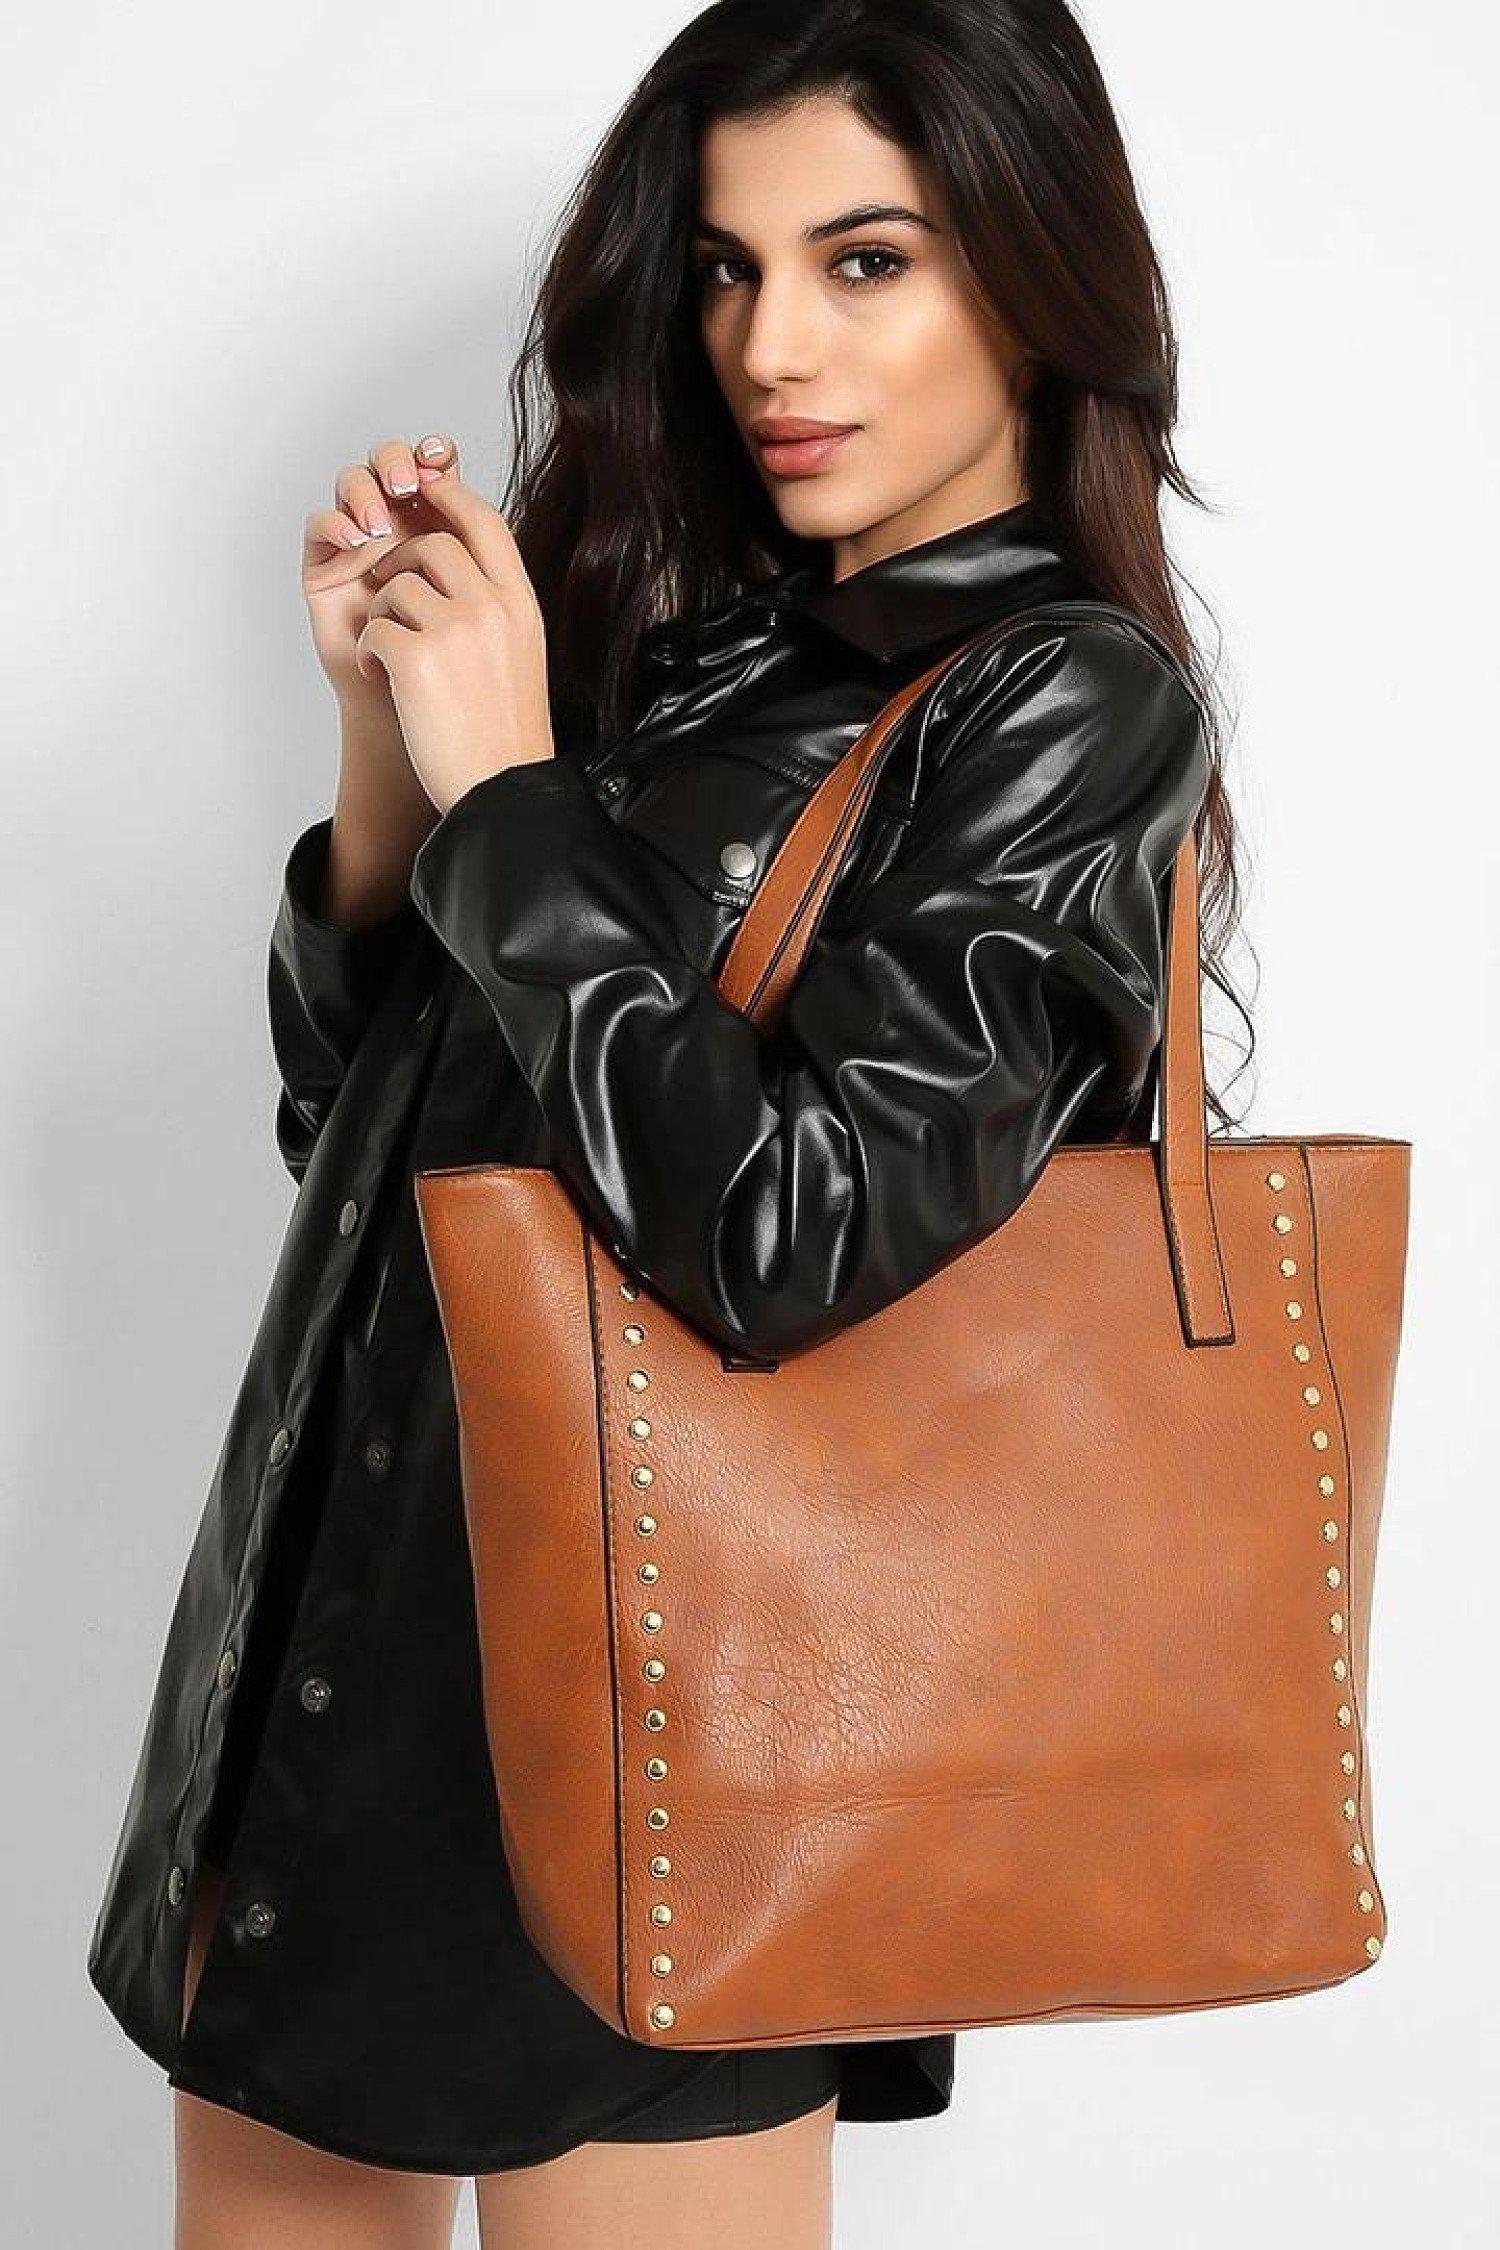 Tan Leather Gold Stud Bag Free Postage